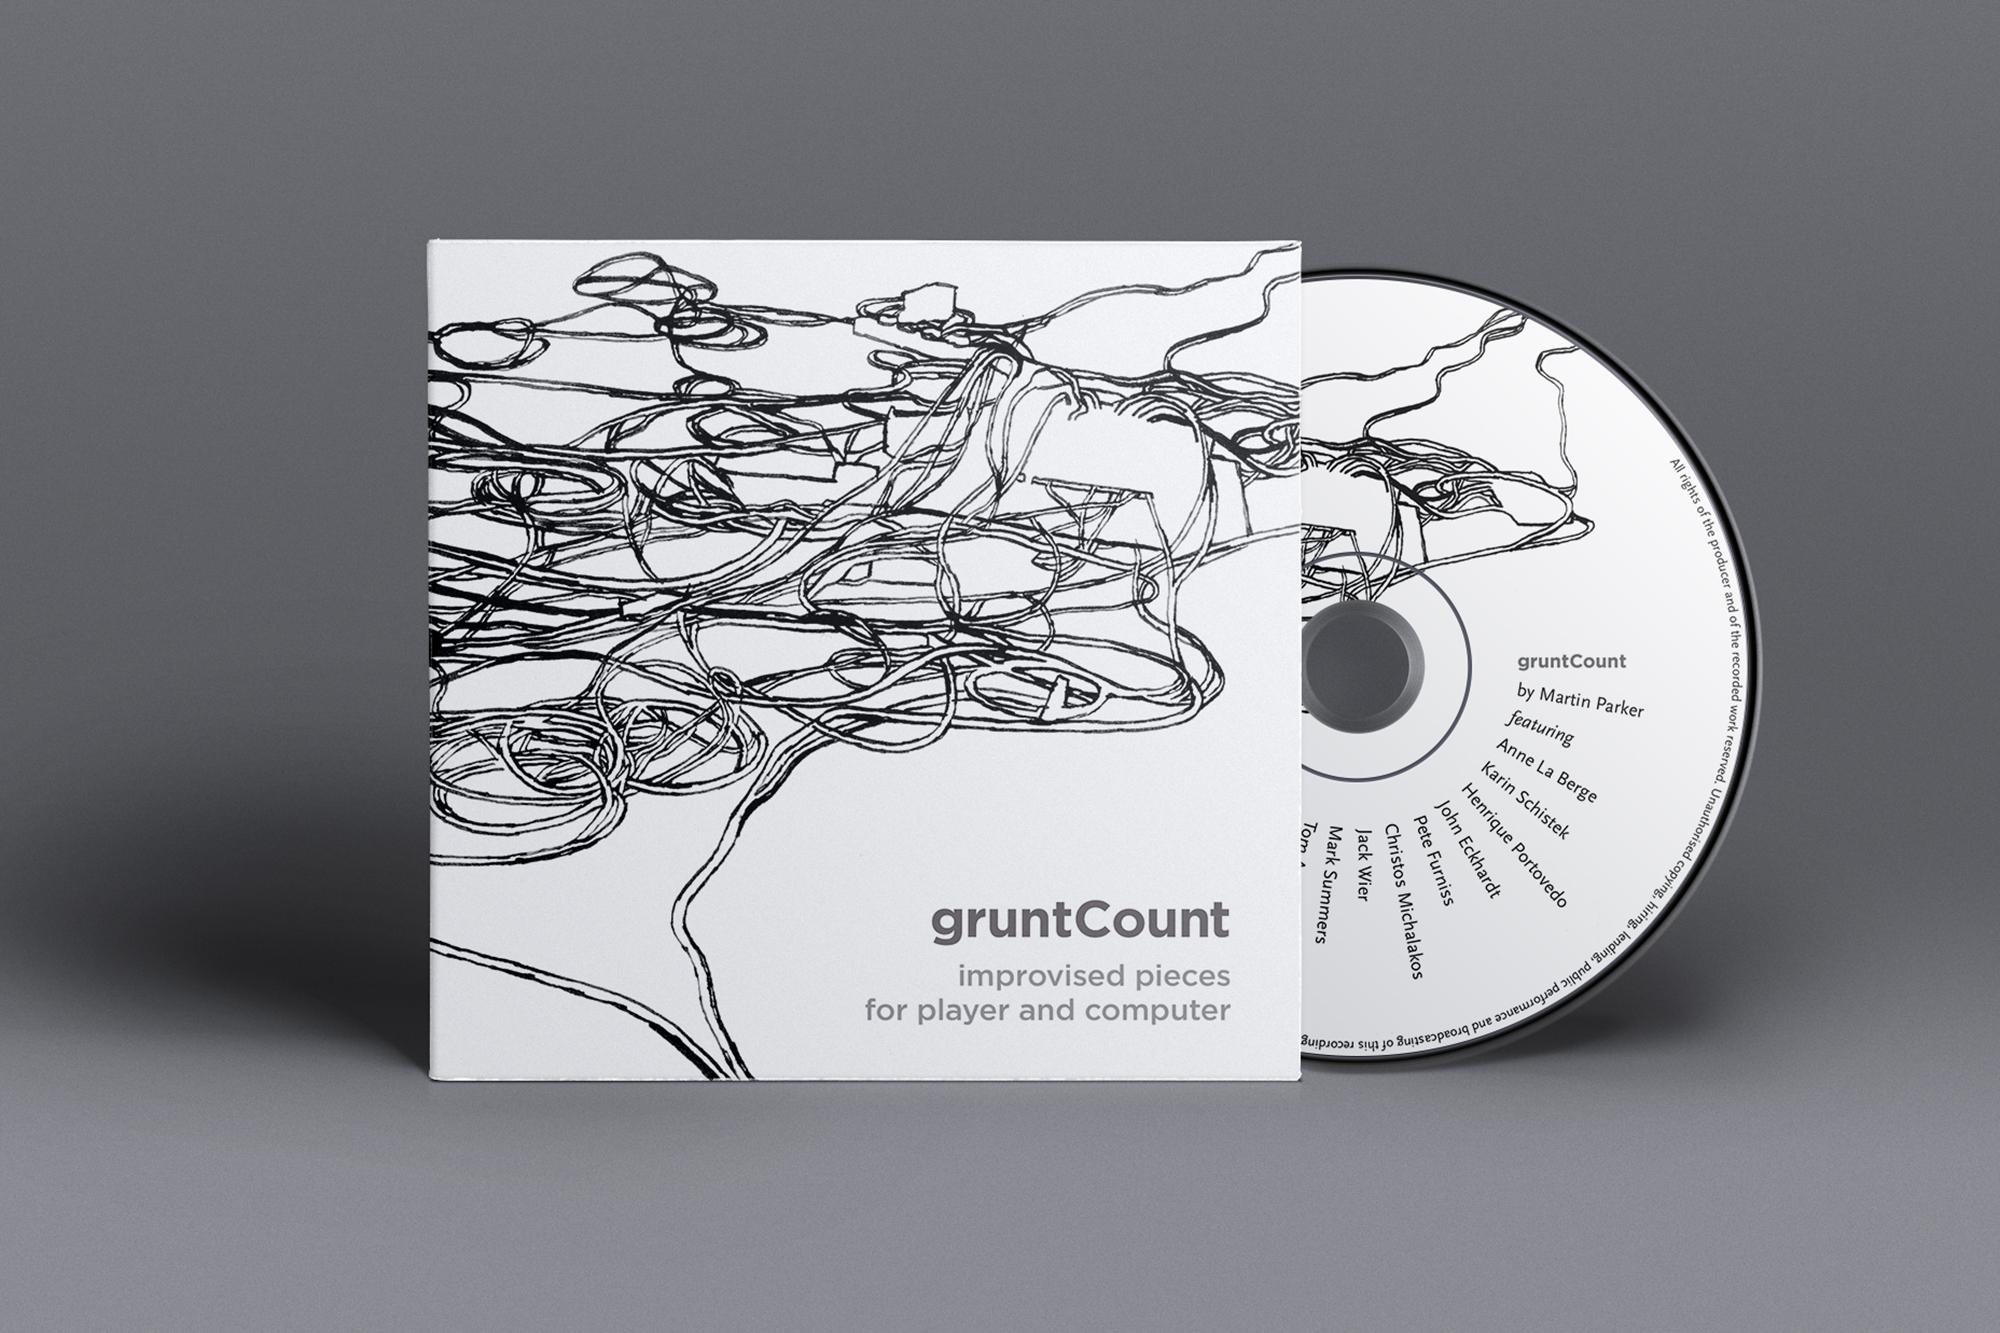 Martin Parker: gruntCount